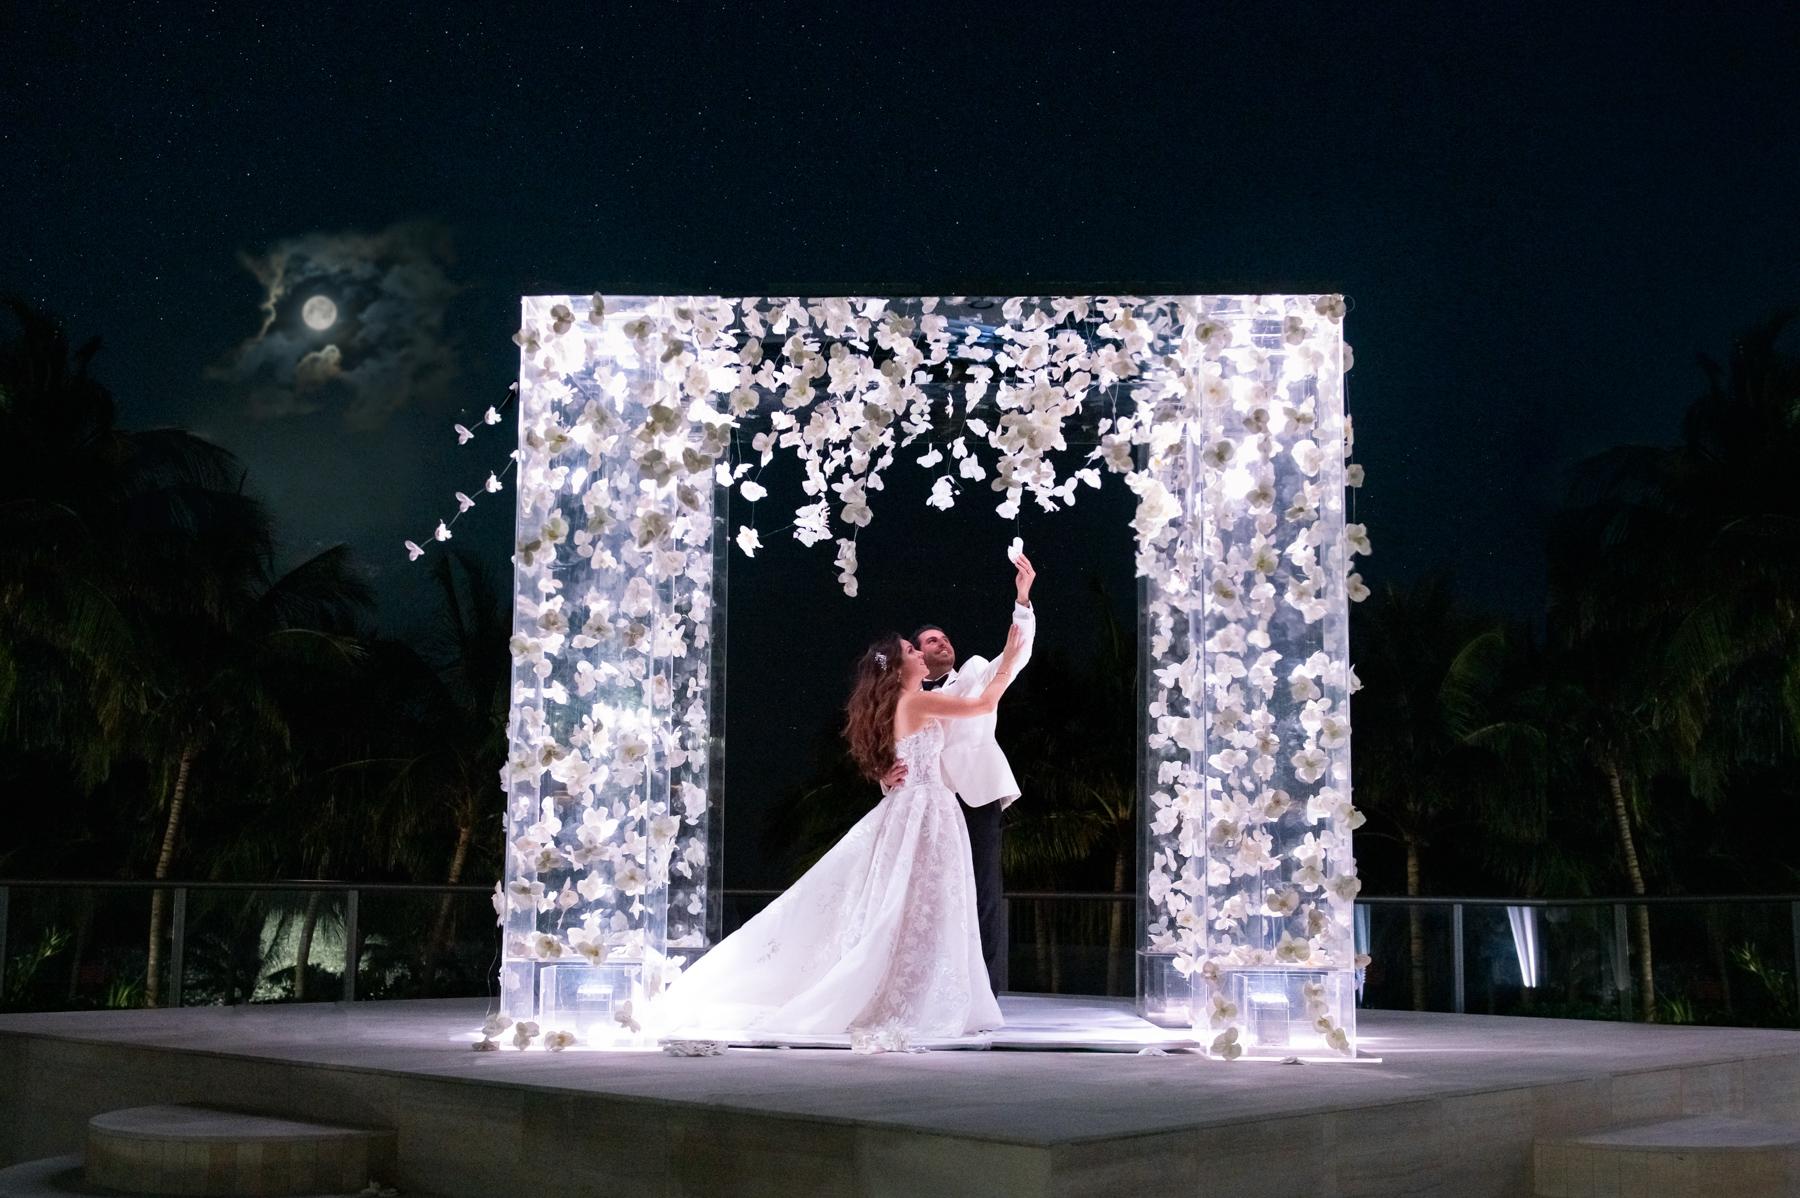 Positano Italian theme Wedding at St Regis, Bal Harbour